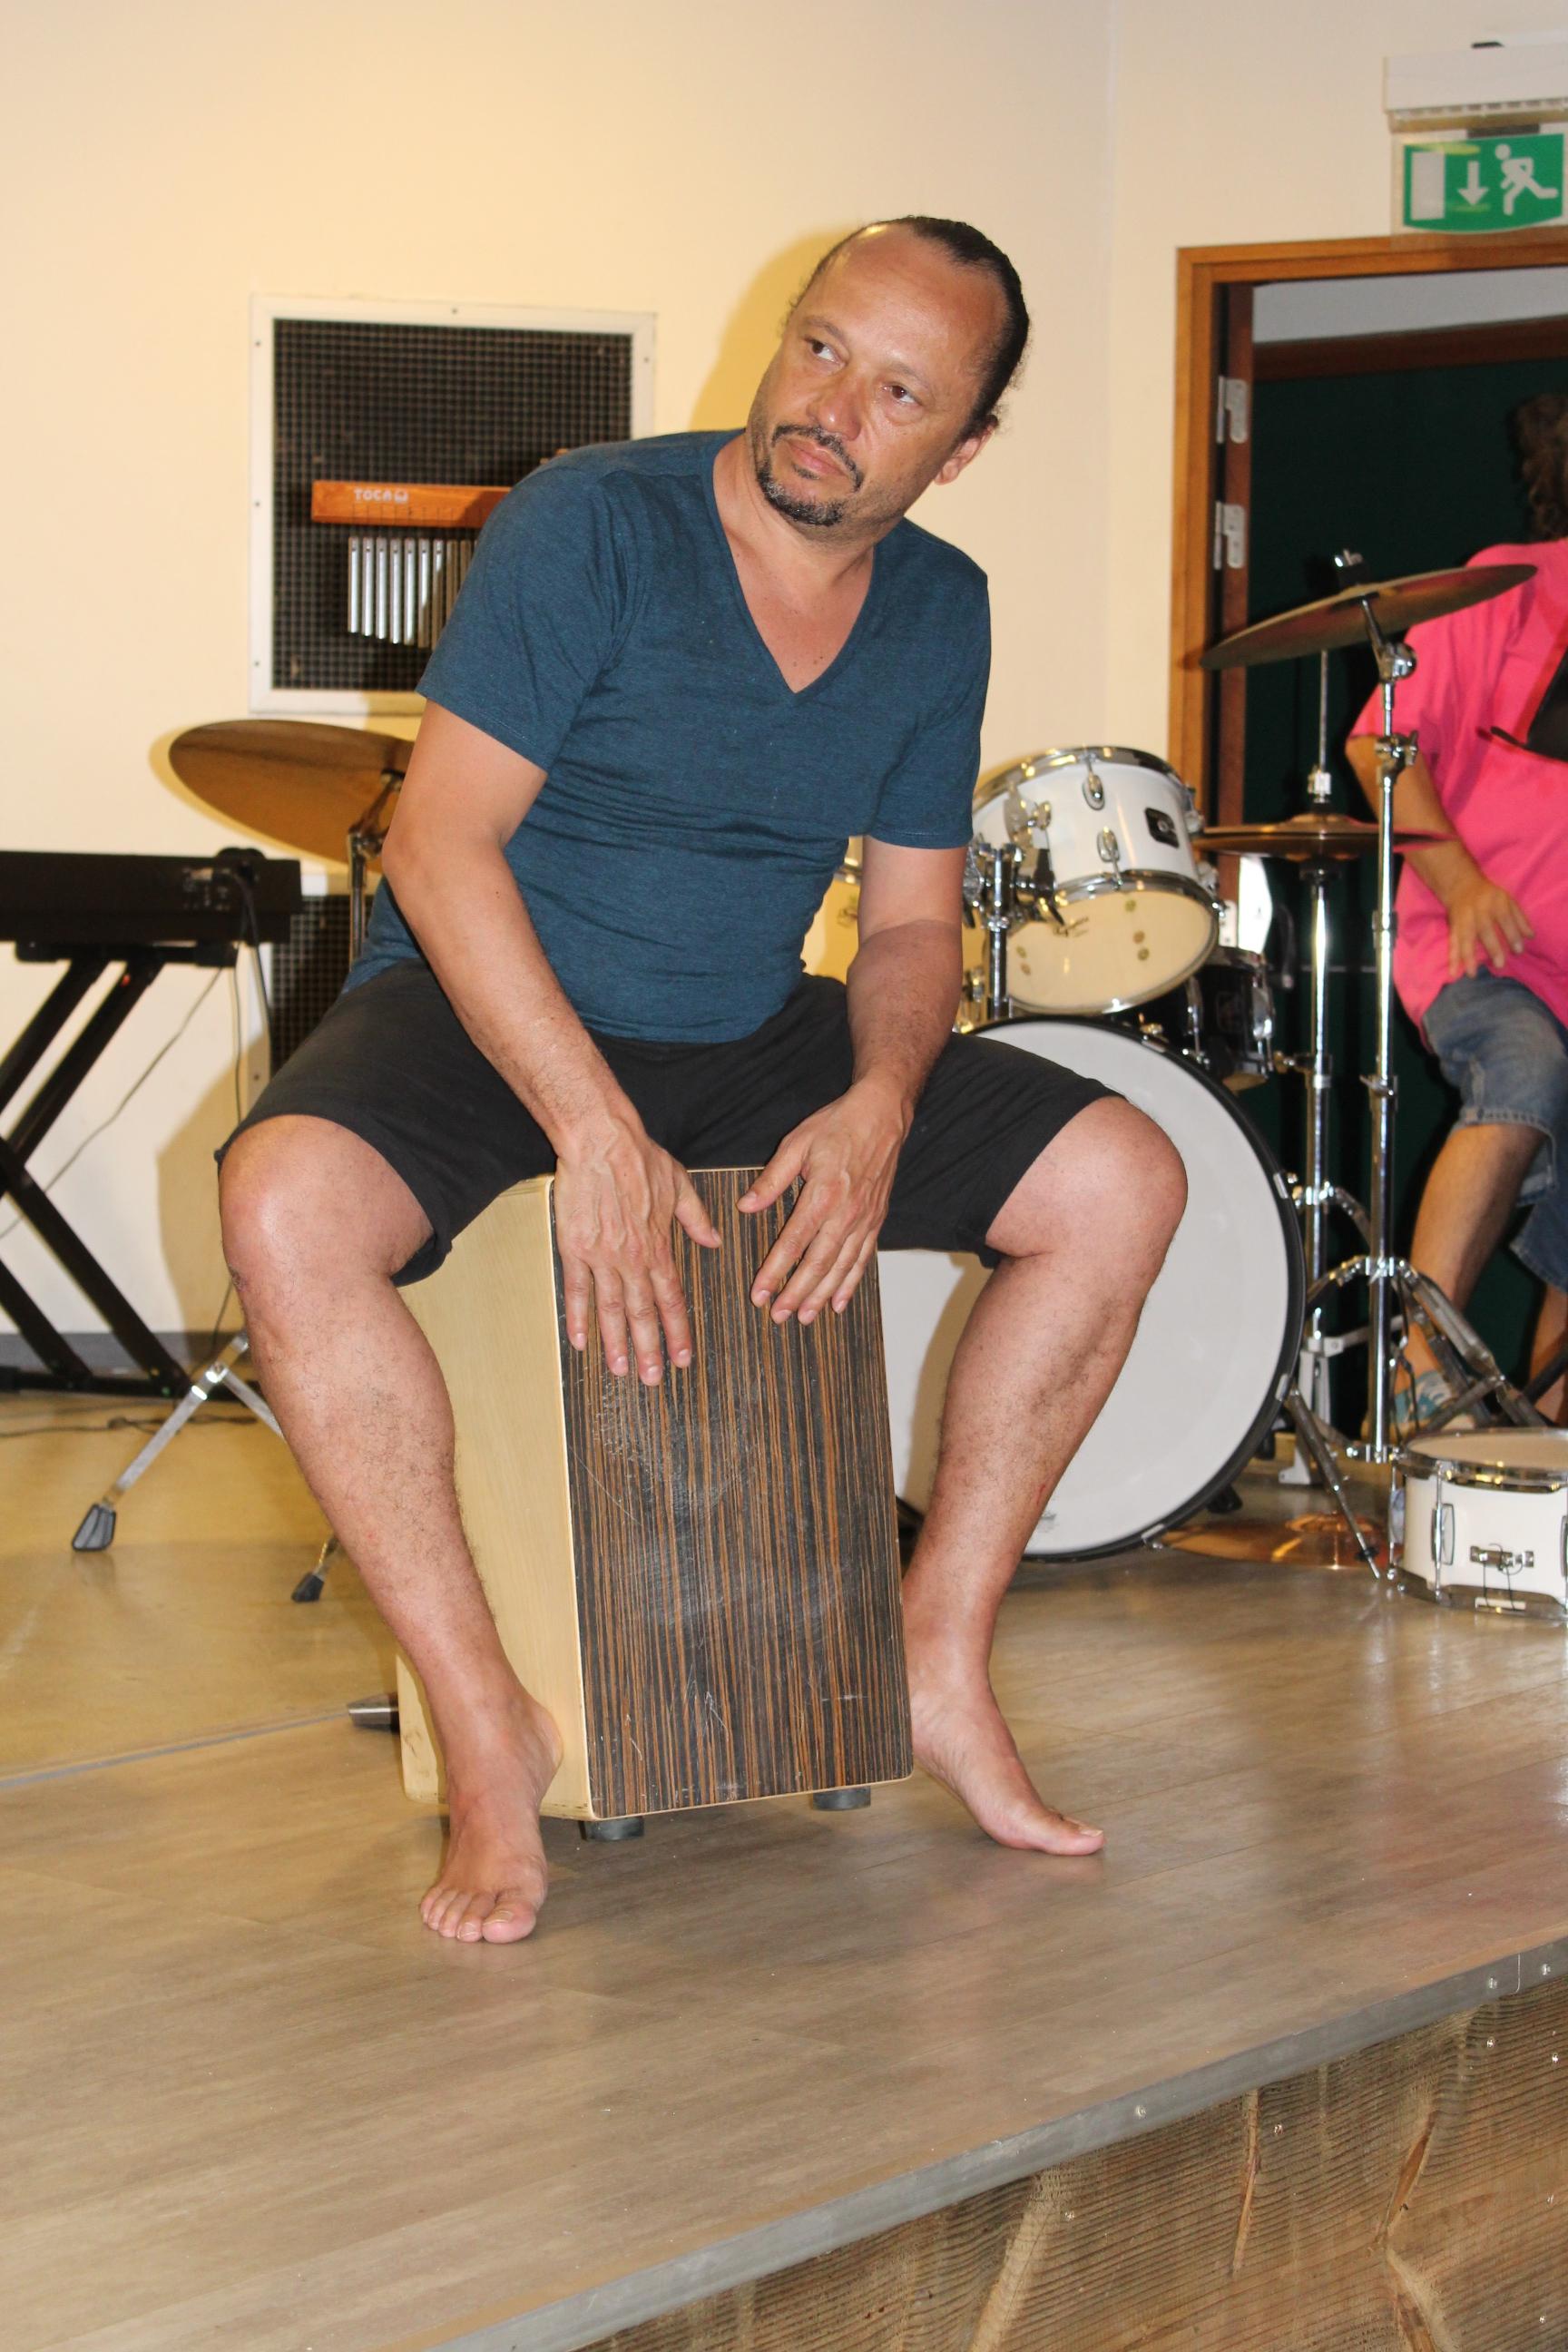 David Donatien, avec qui Yael Naim collabore depuis près de 15 ans maintenant.